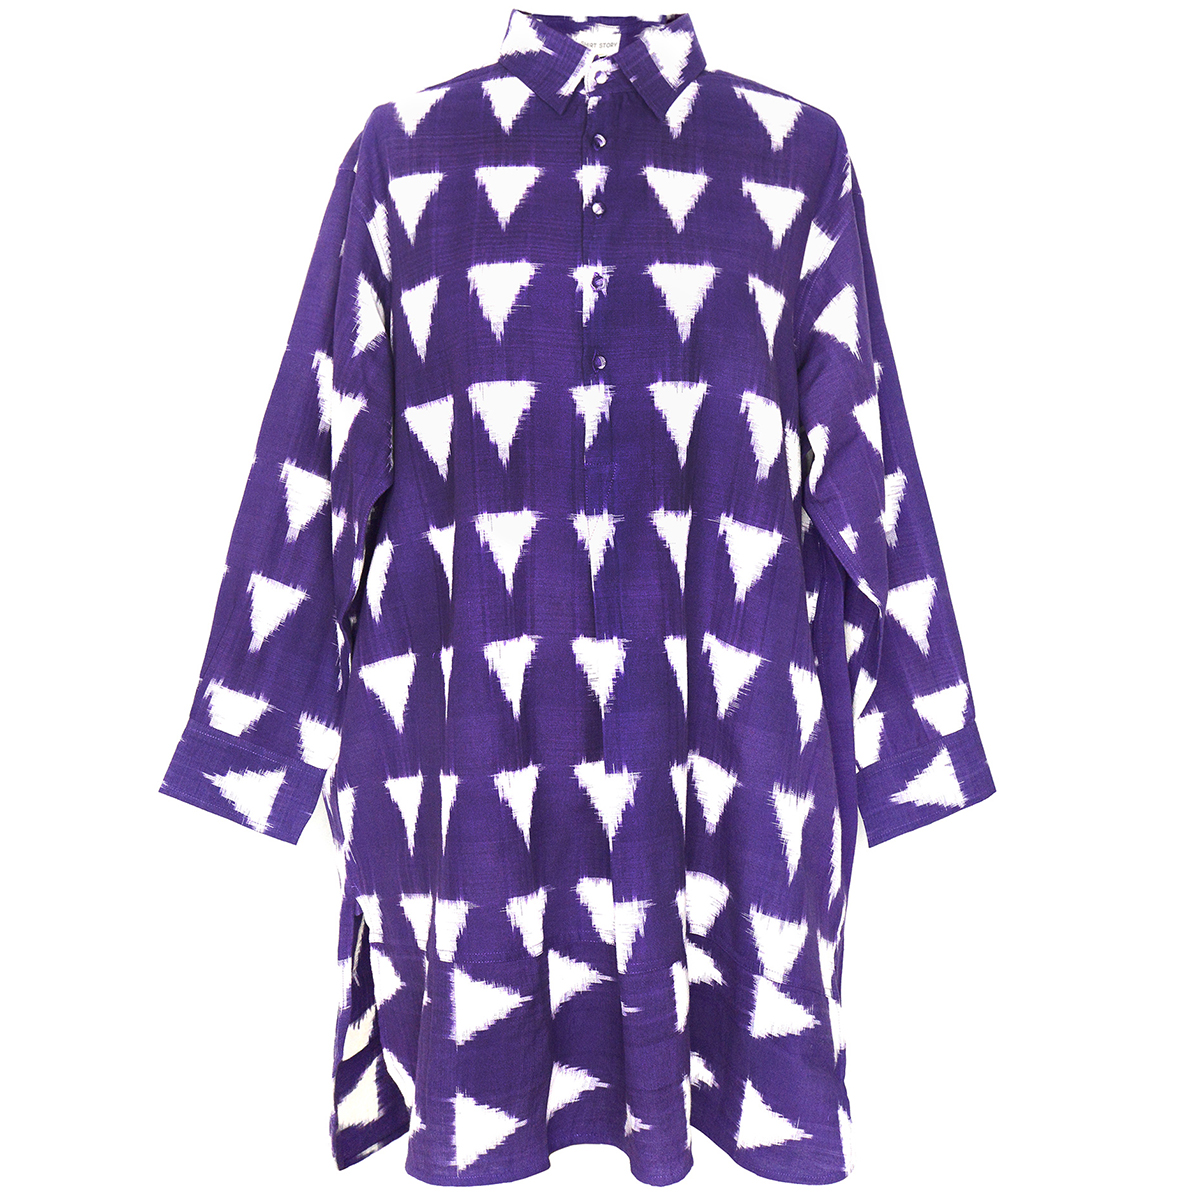 Aubergine Ikat shirt